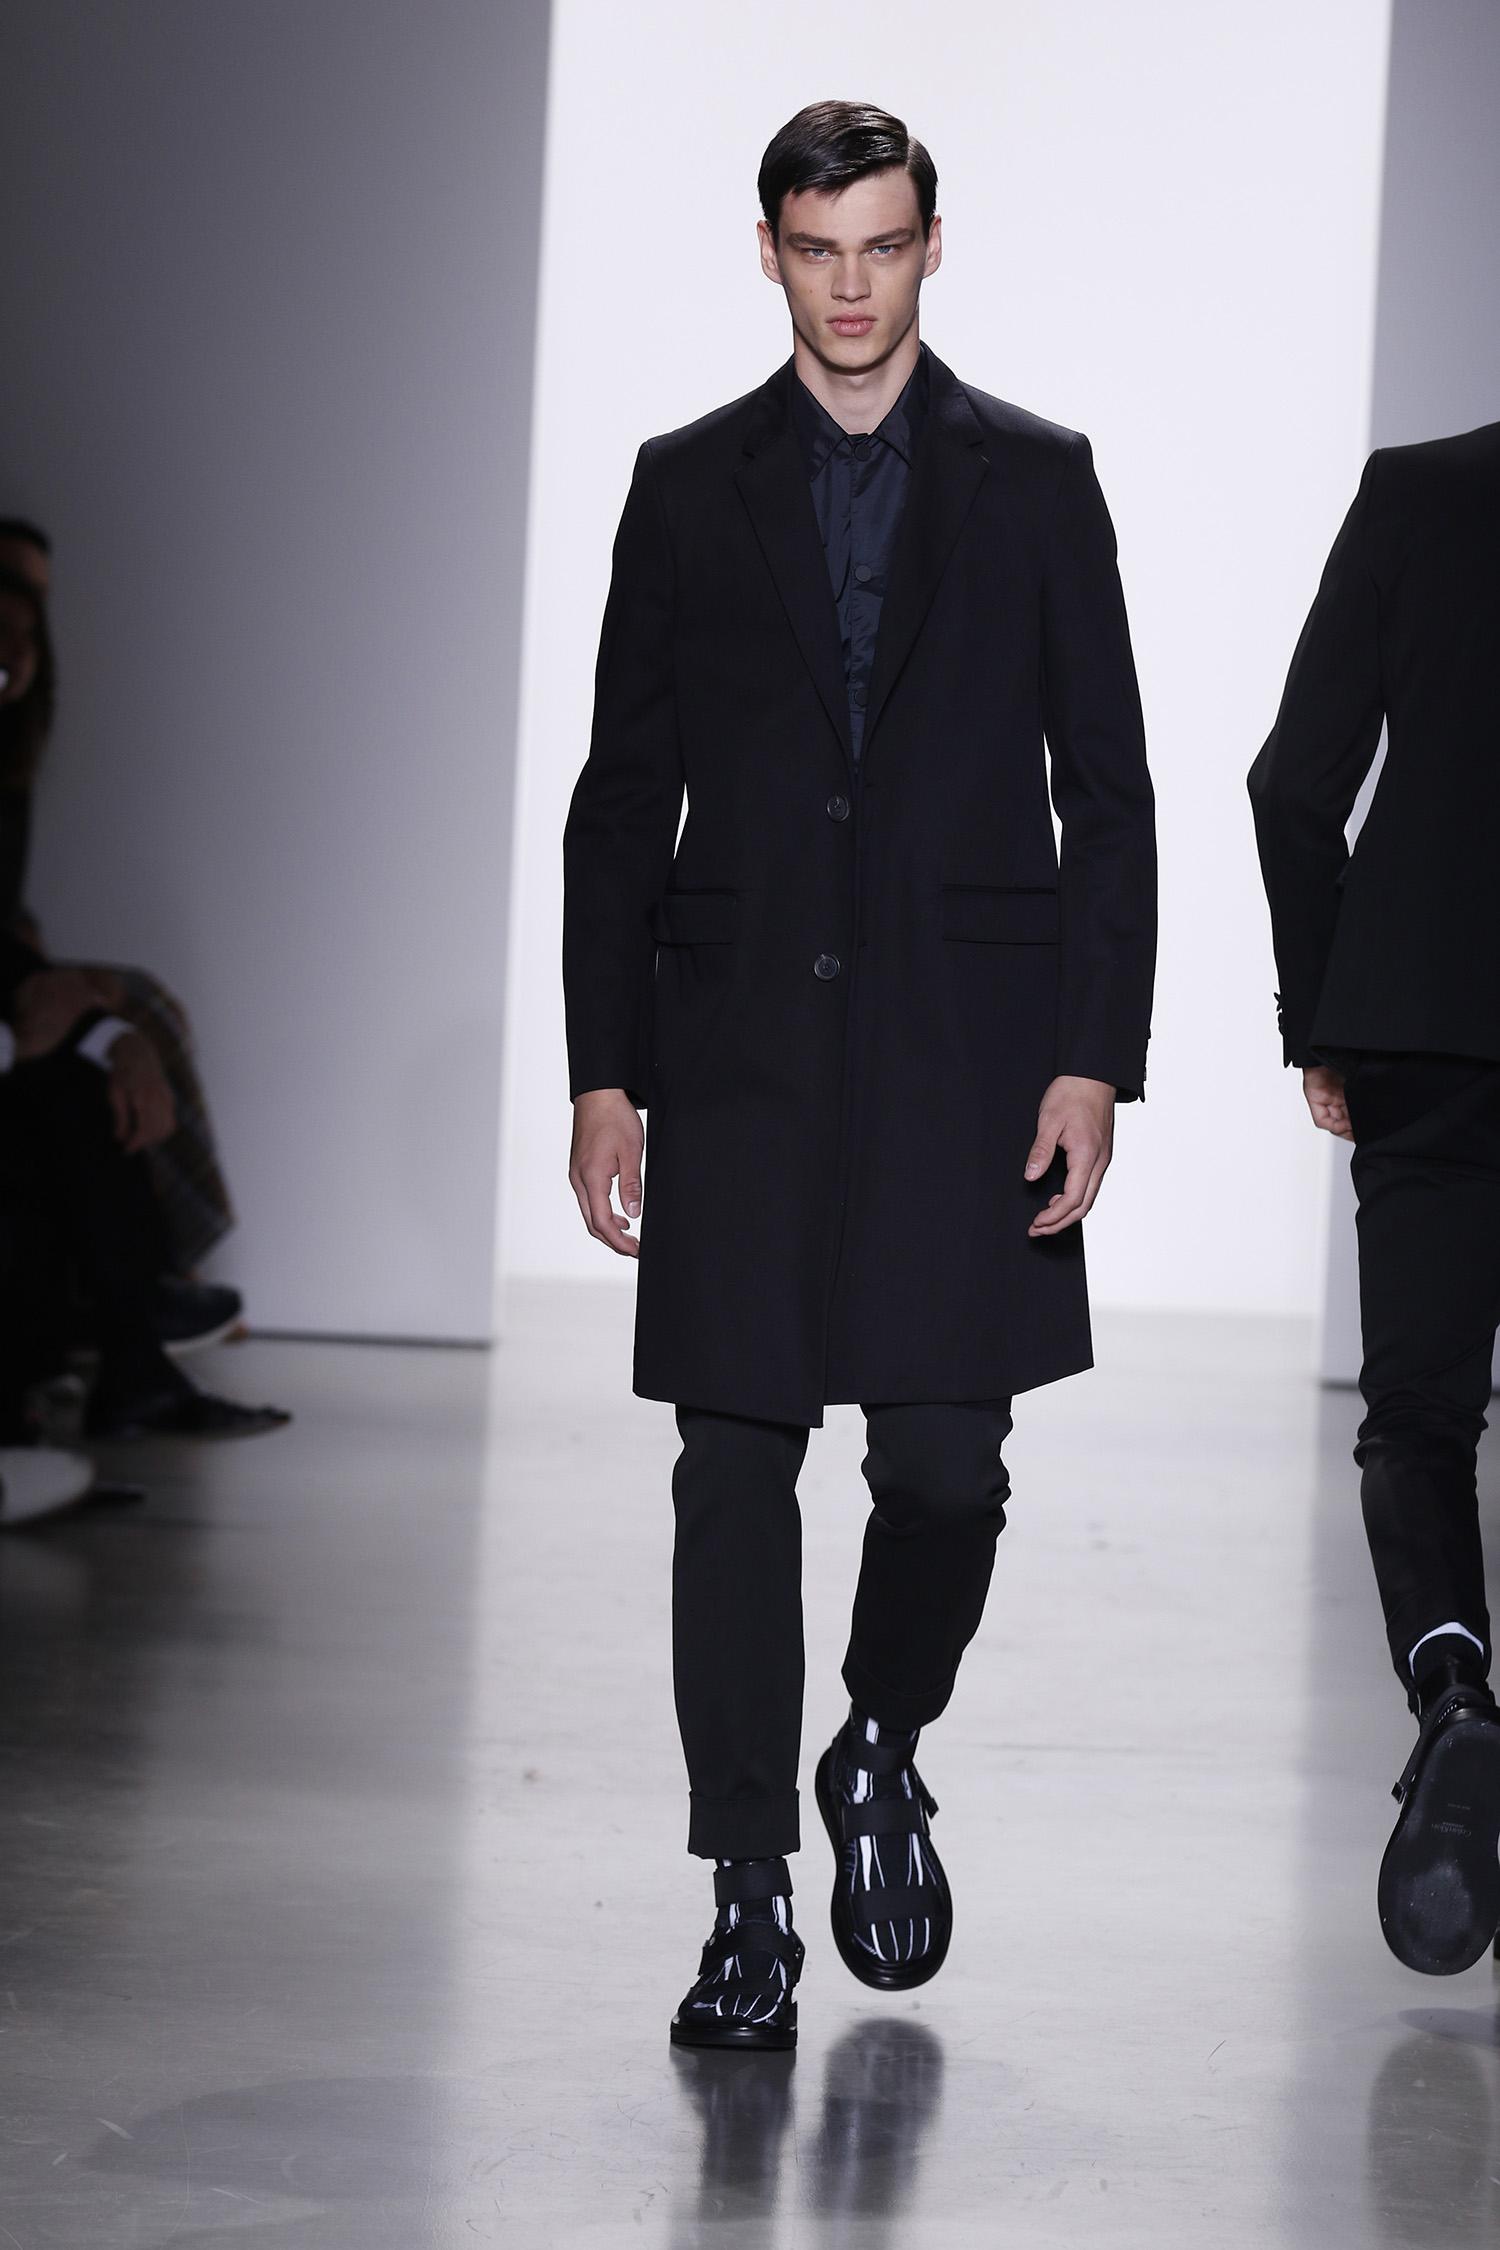 251c58cf50 Italo Zucchelli s Calvin Klein Collection Spring 2016 - Daily Front Row